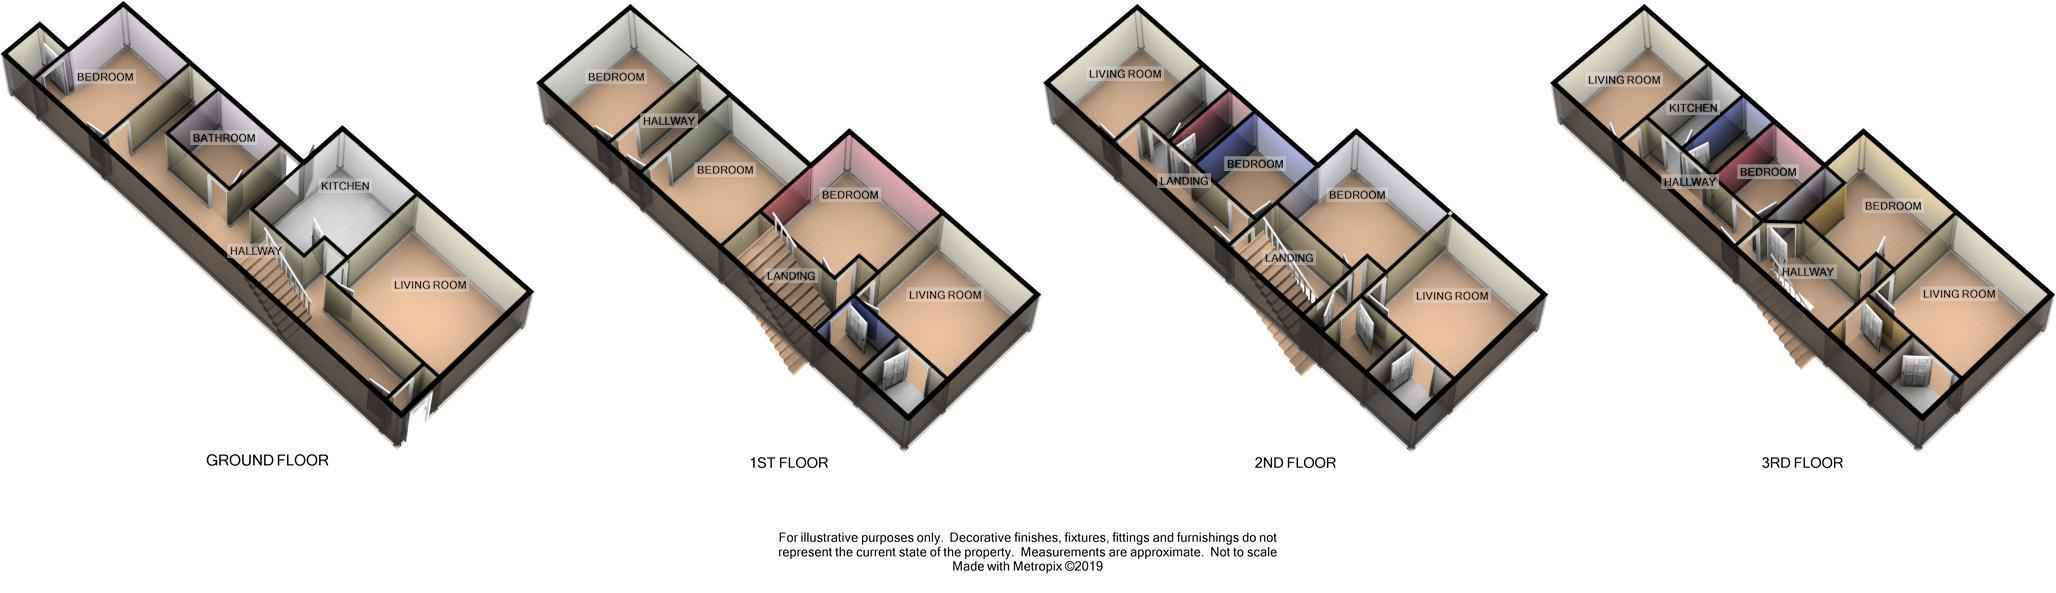 26 Christian Road, Douglas Floorplan